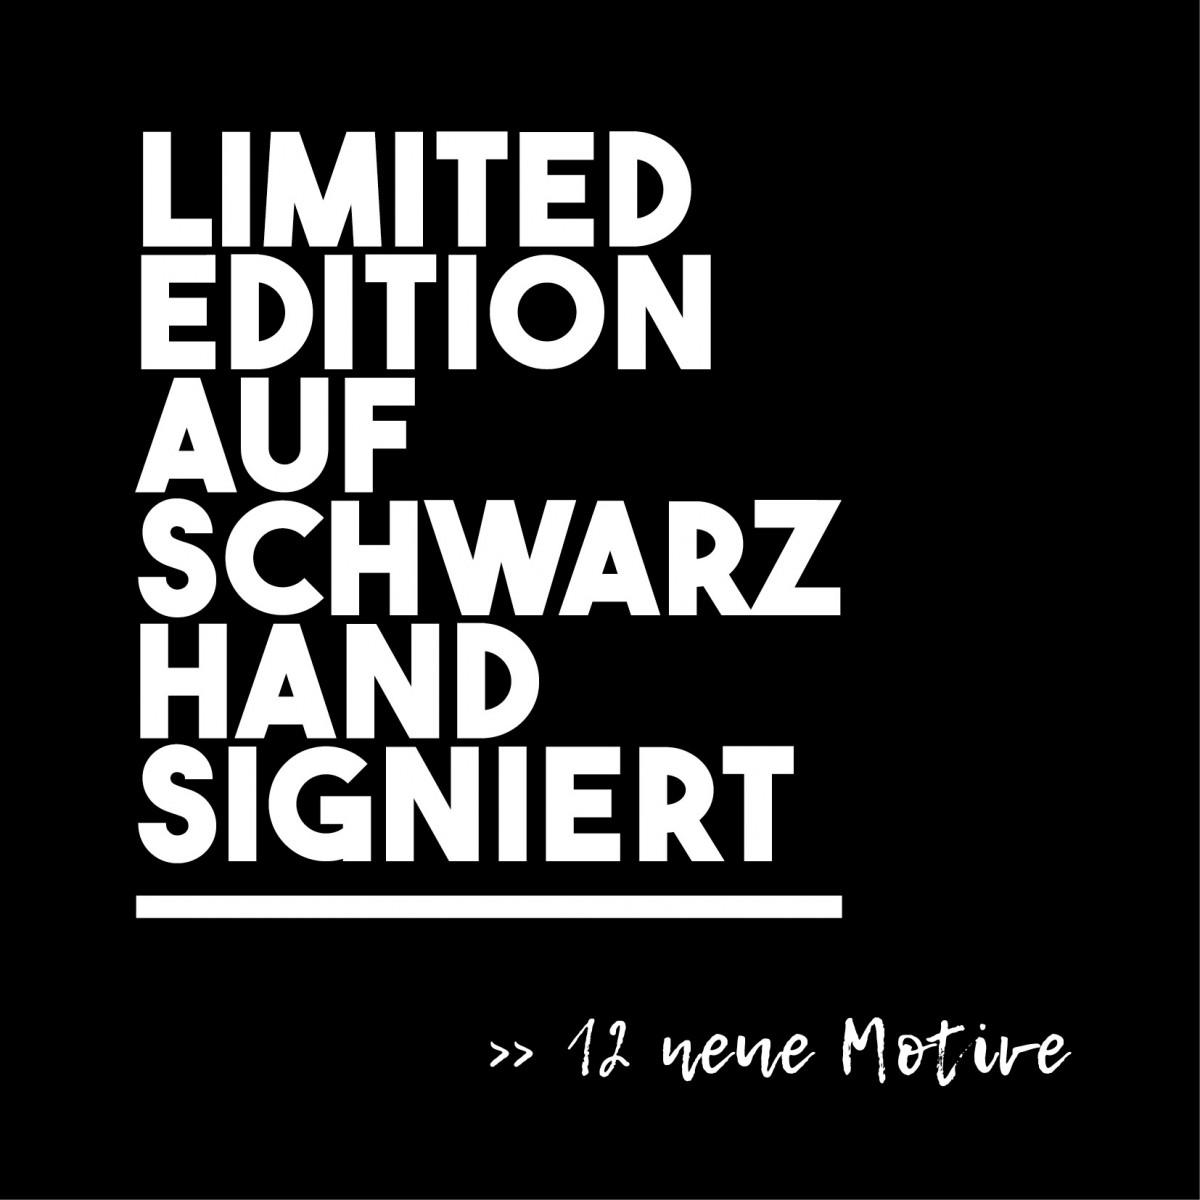 FrankfurterBubb SO OVERFORDERT Limited Edition  schwarz-weiß Foto-Kachel